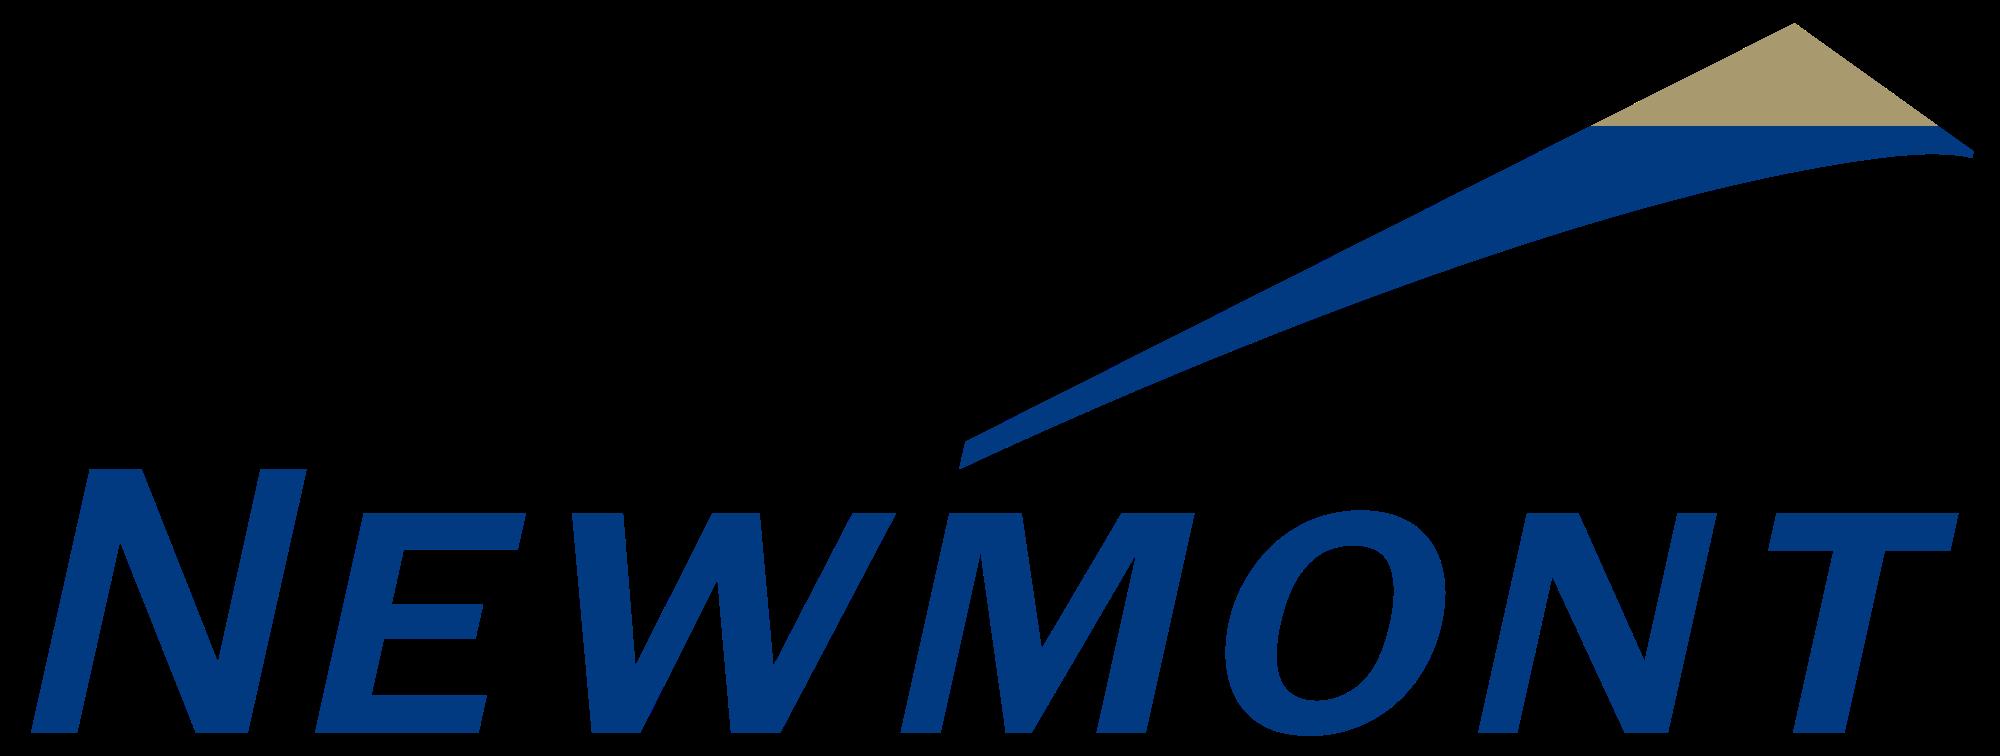 Newmont Mining Corporation